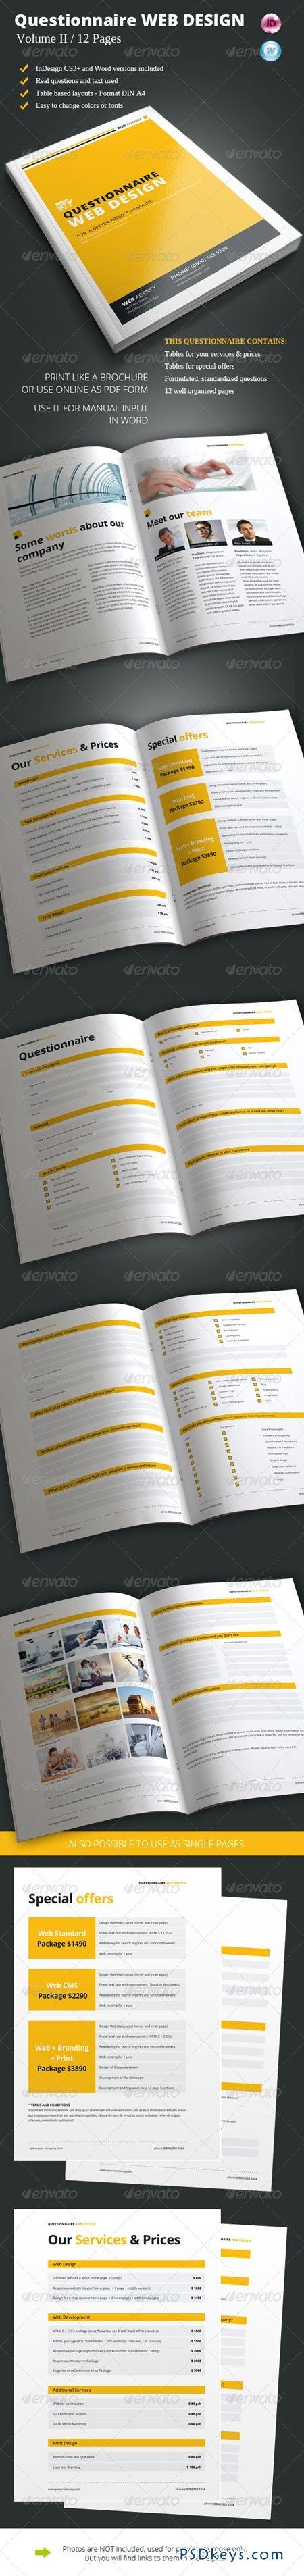 Questionnaire Web Design Vol. II 6837693